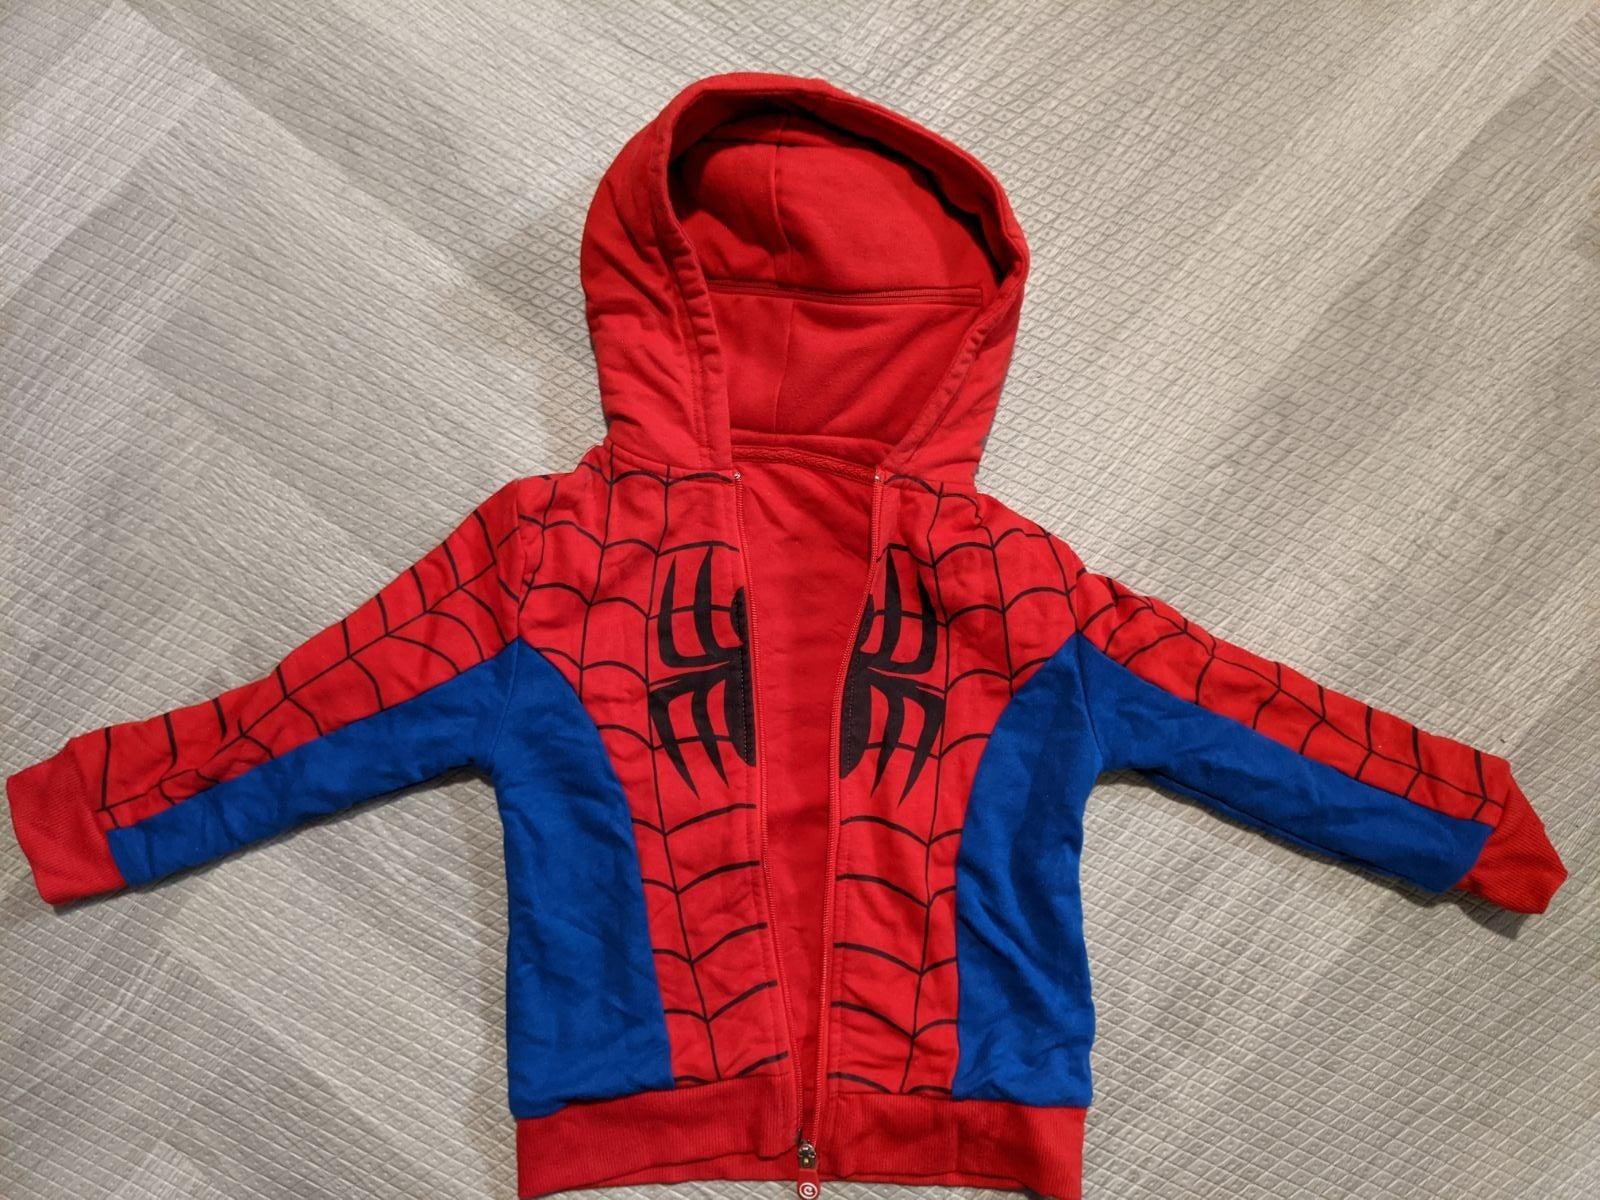 Spider-Man Cubcoat